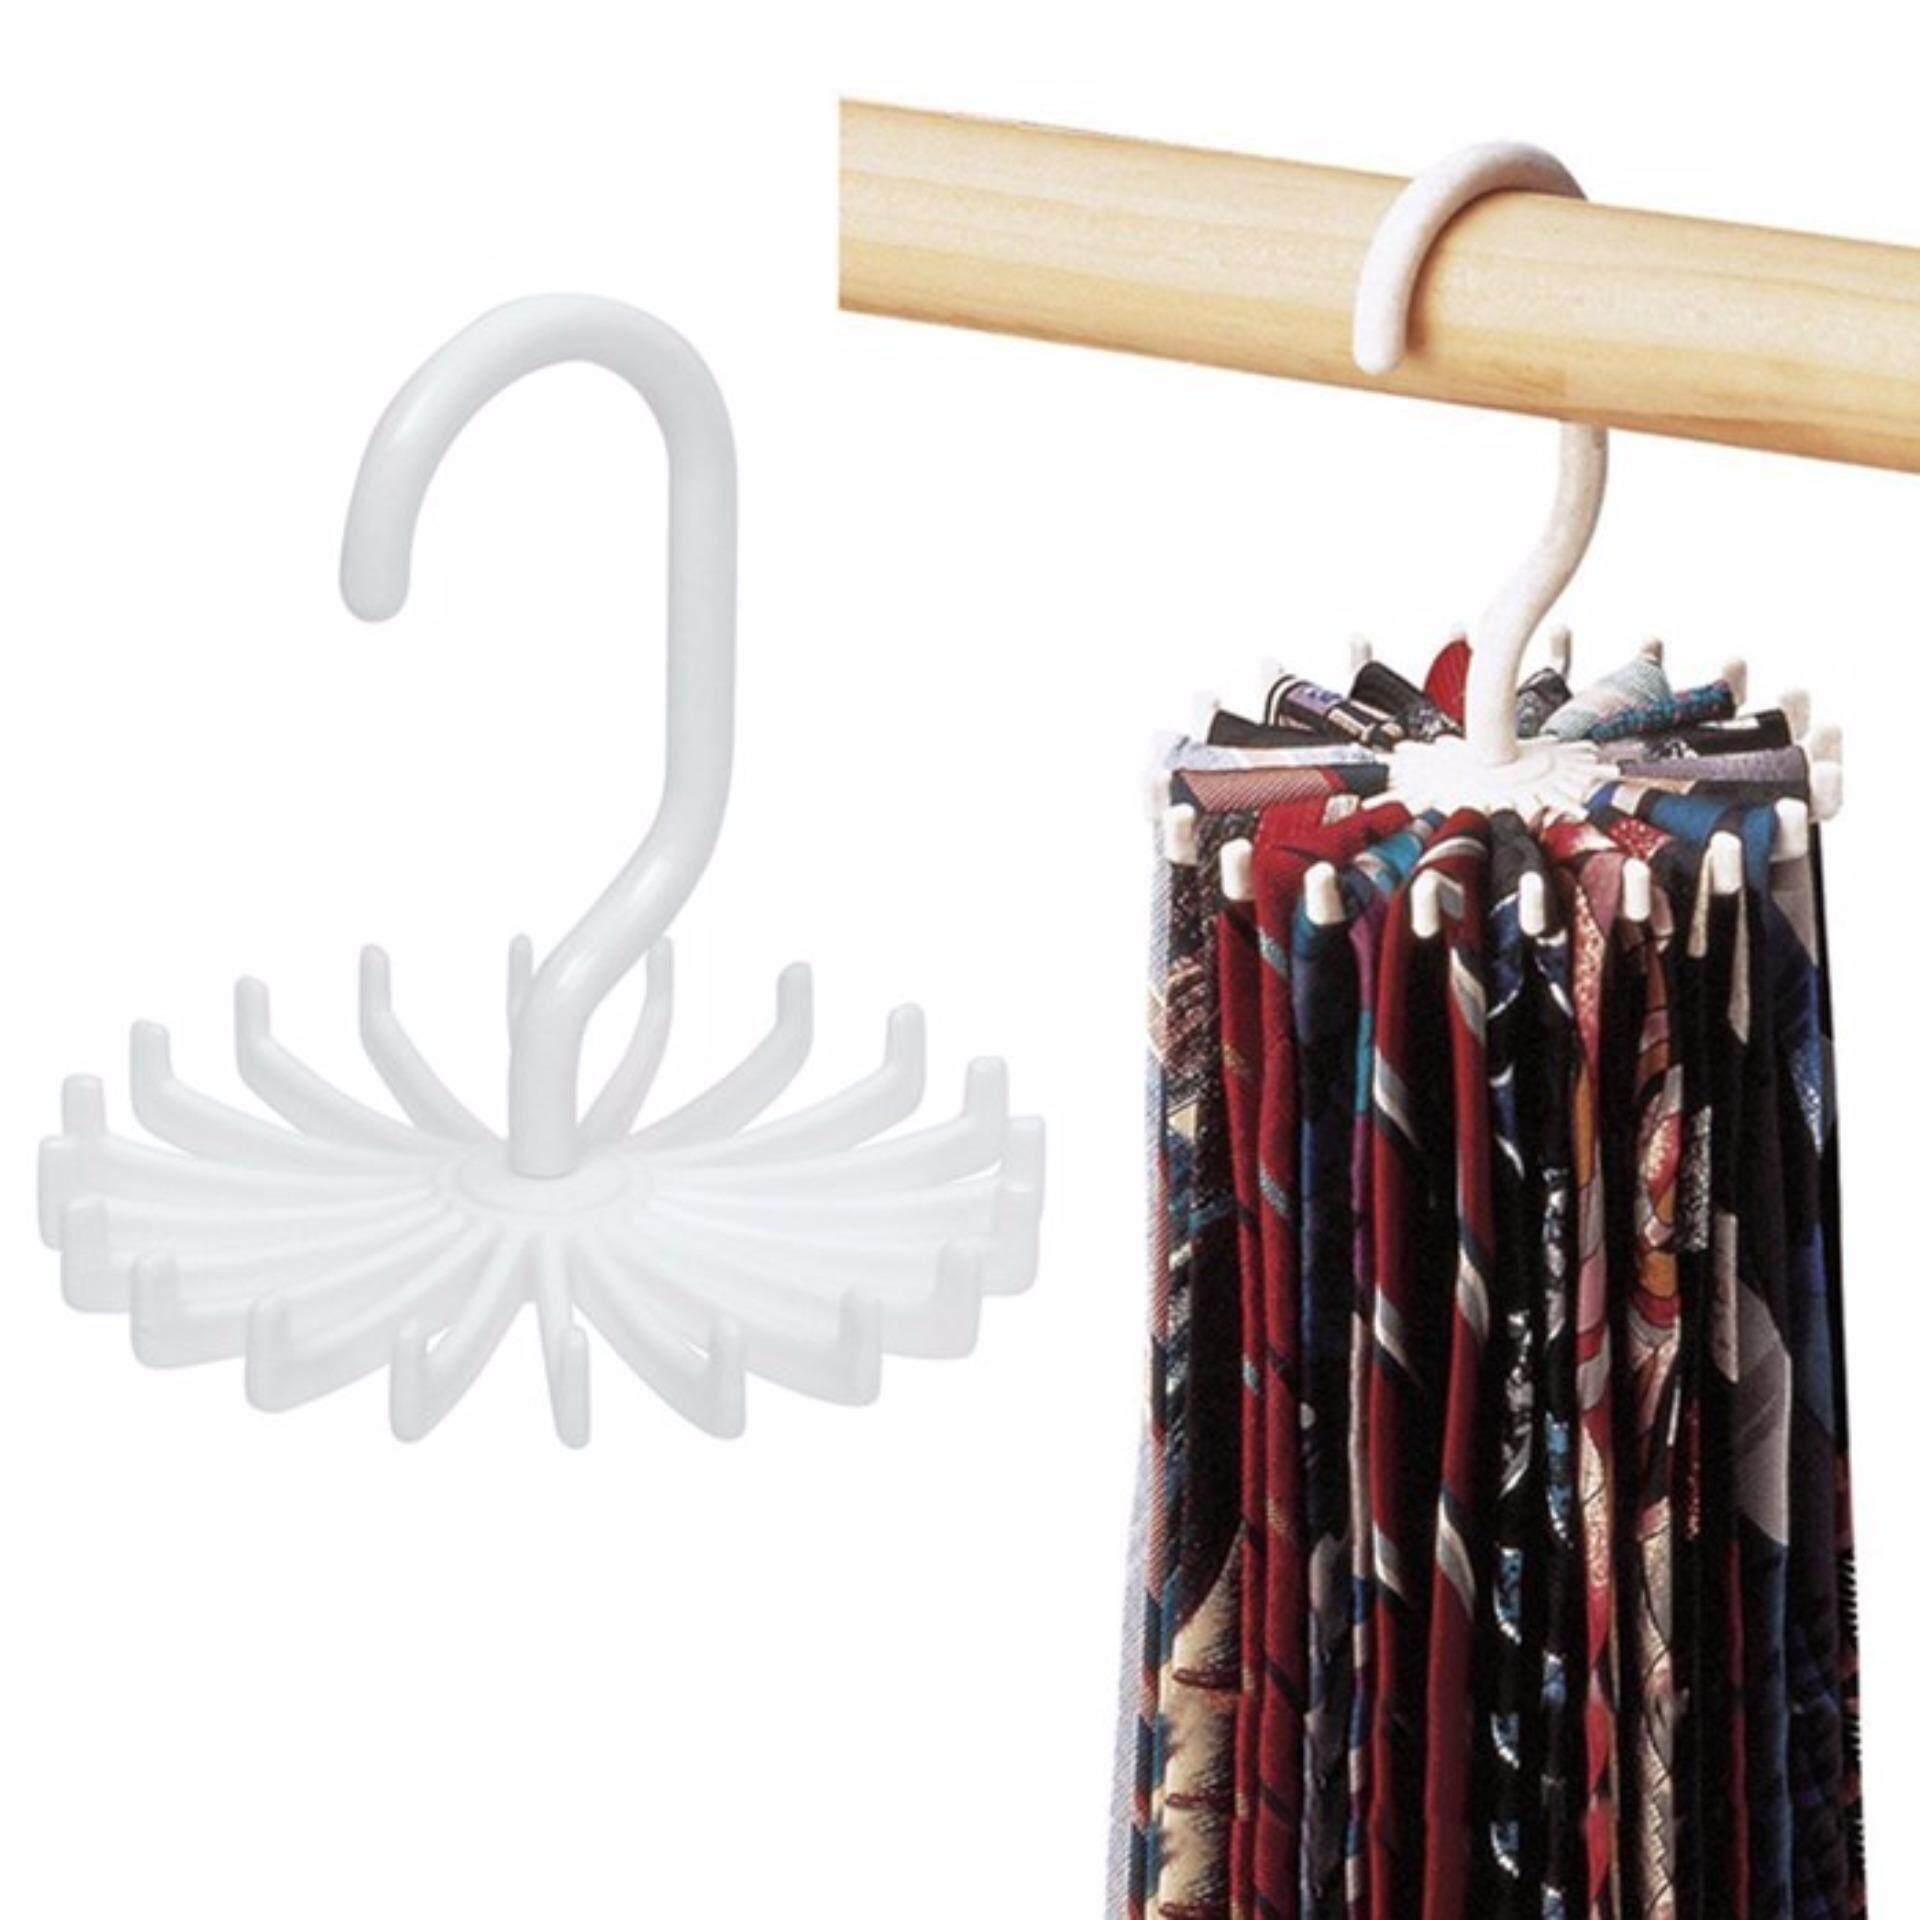 360° Rotating Belts Rack Ties Hanger Holder 20 Hooks Neck Tie Scarf Organizer